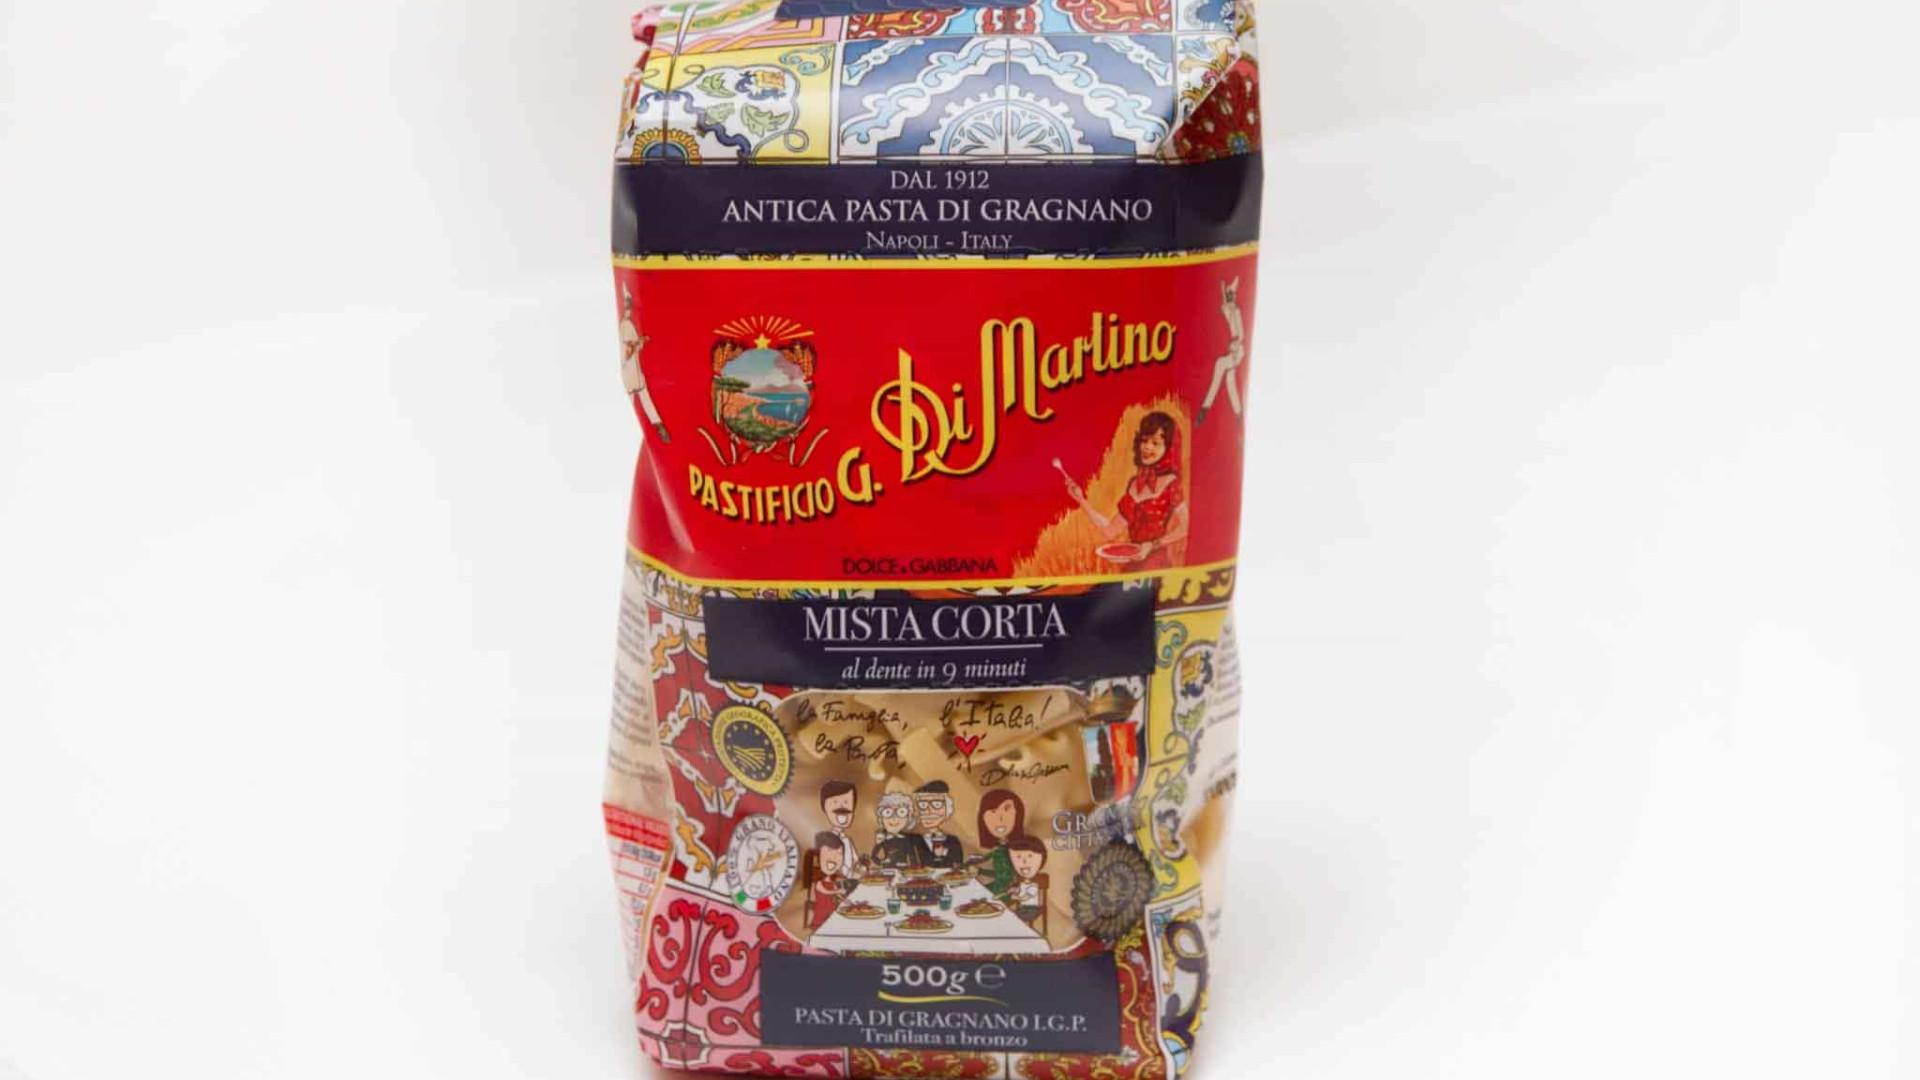 Massa de luxo: Dolce & Gabbana vai vender 'pasta' tradicional italiana